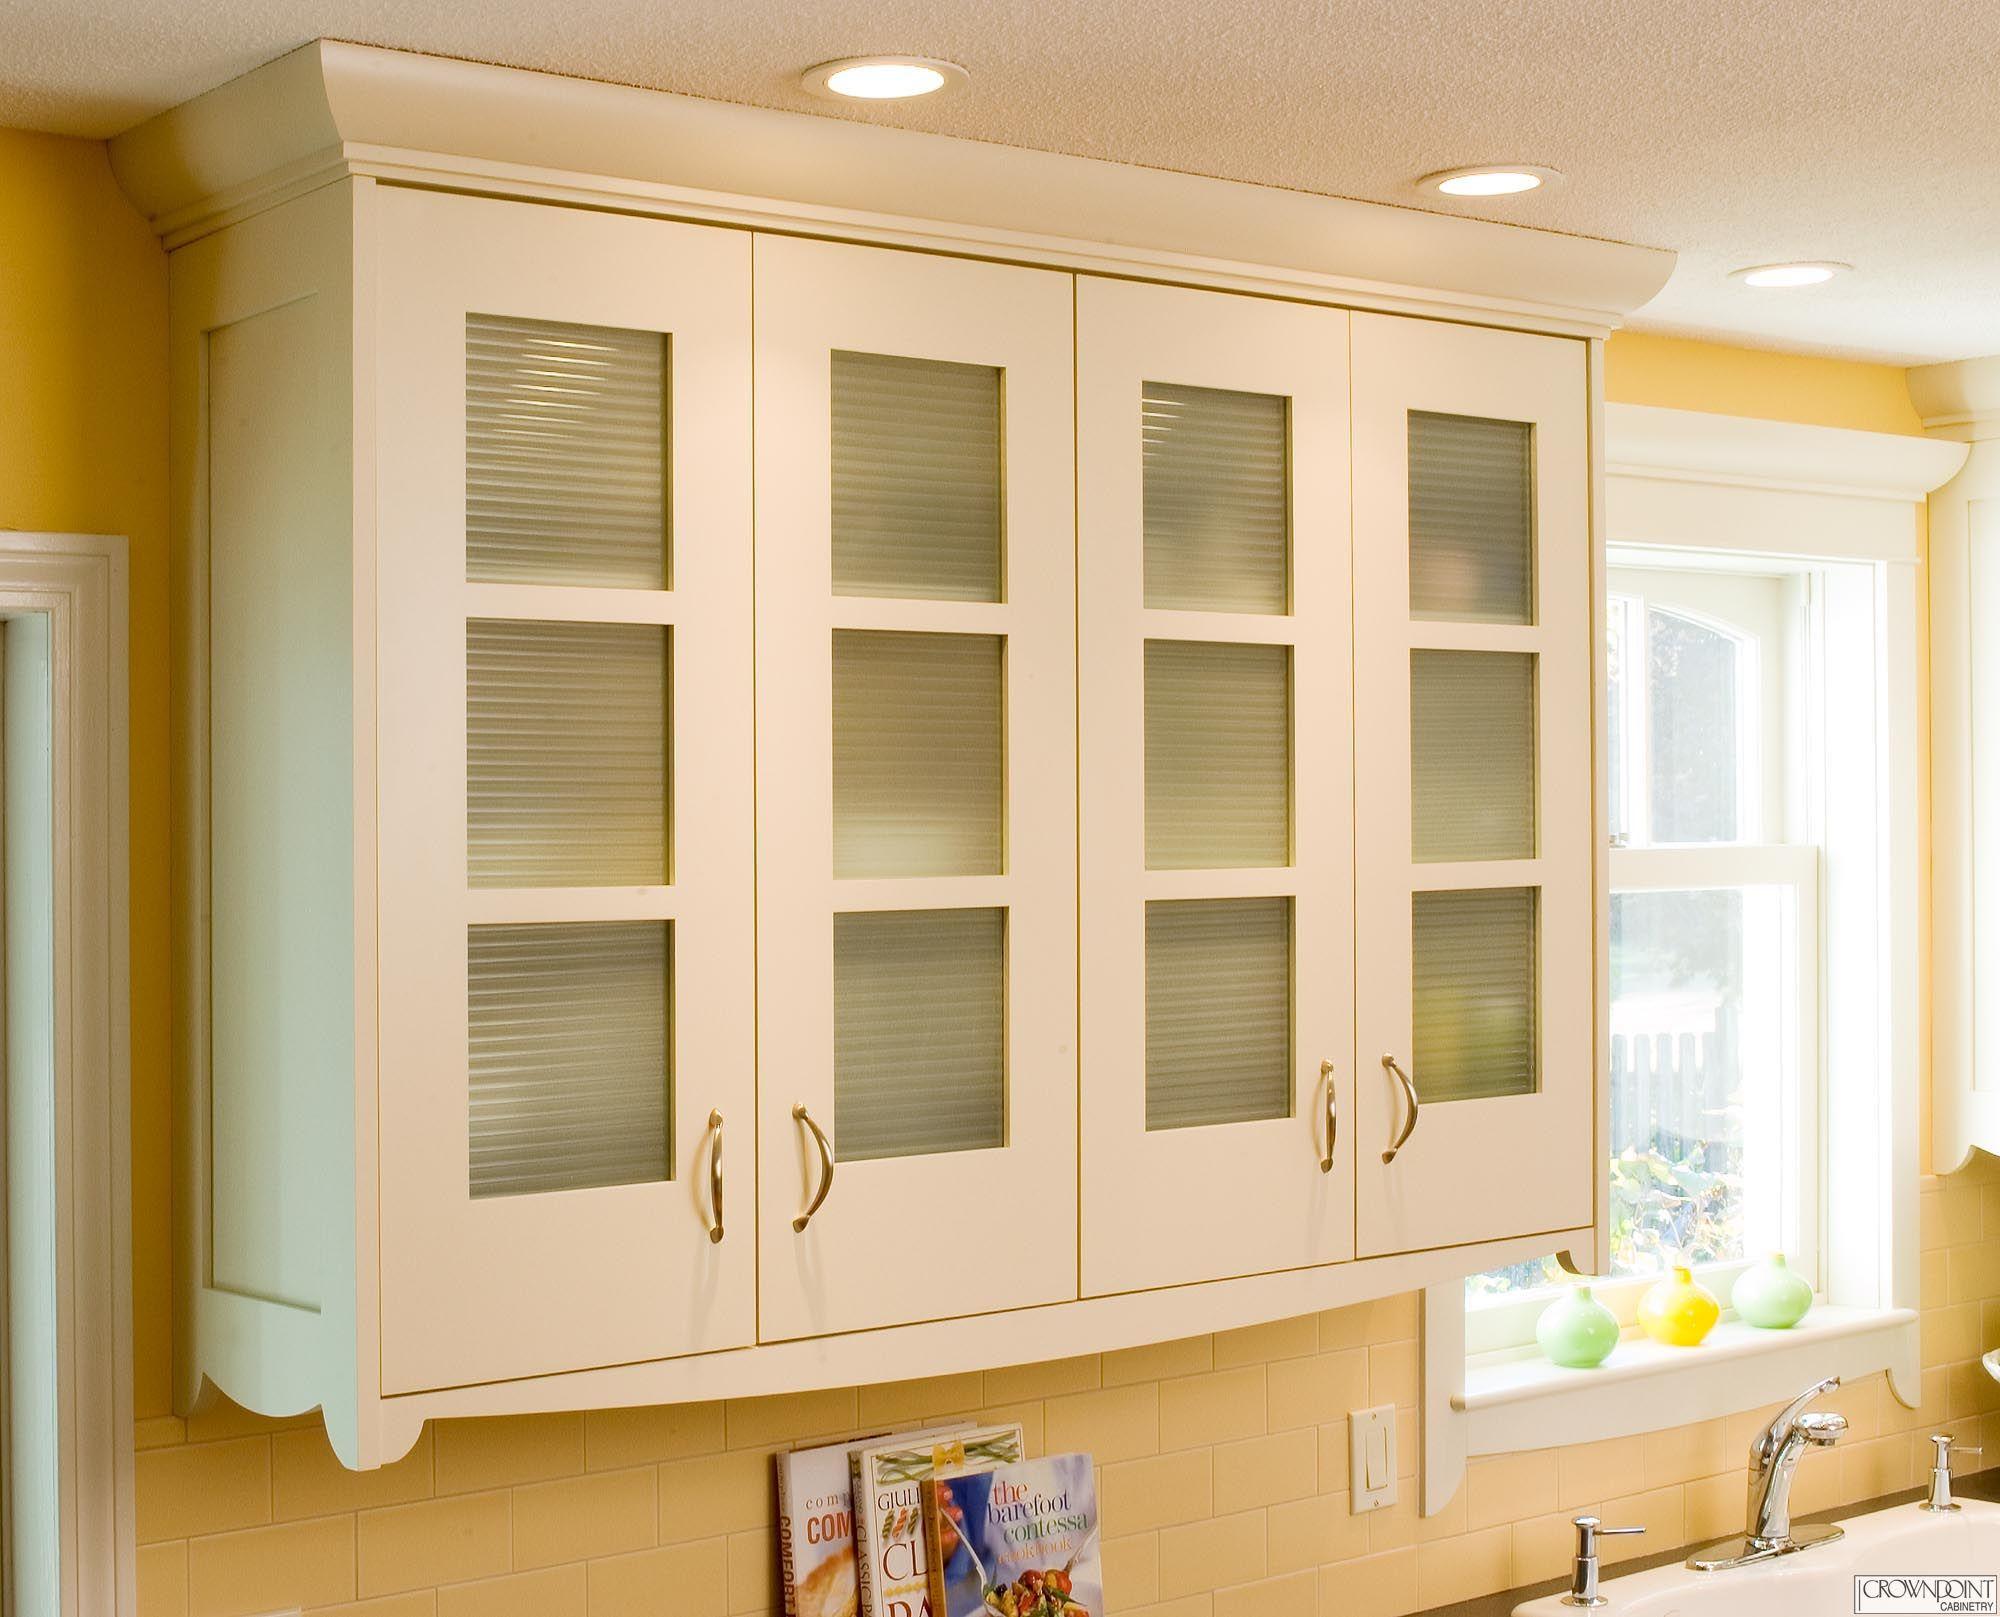 Picture of Creamy Kitchen Glass Door with Metal